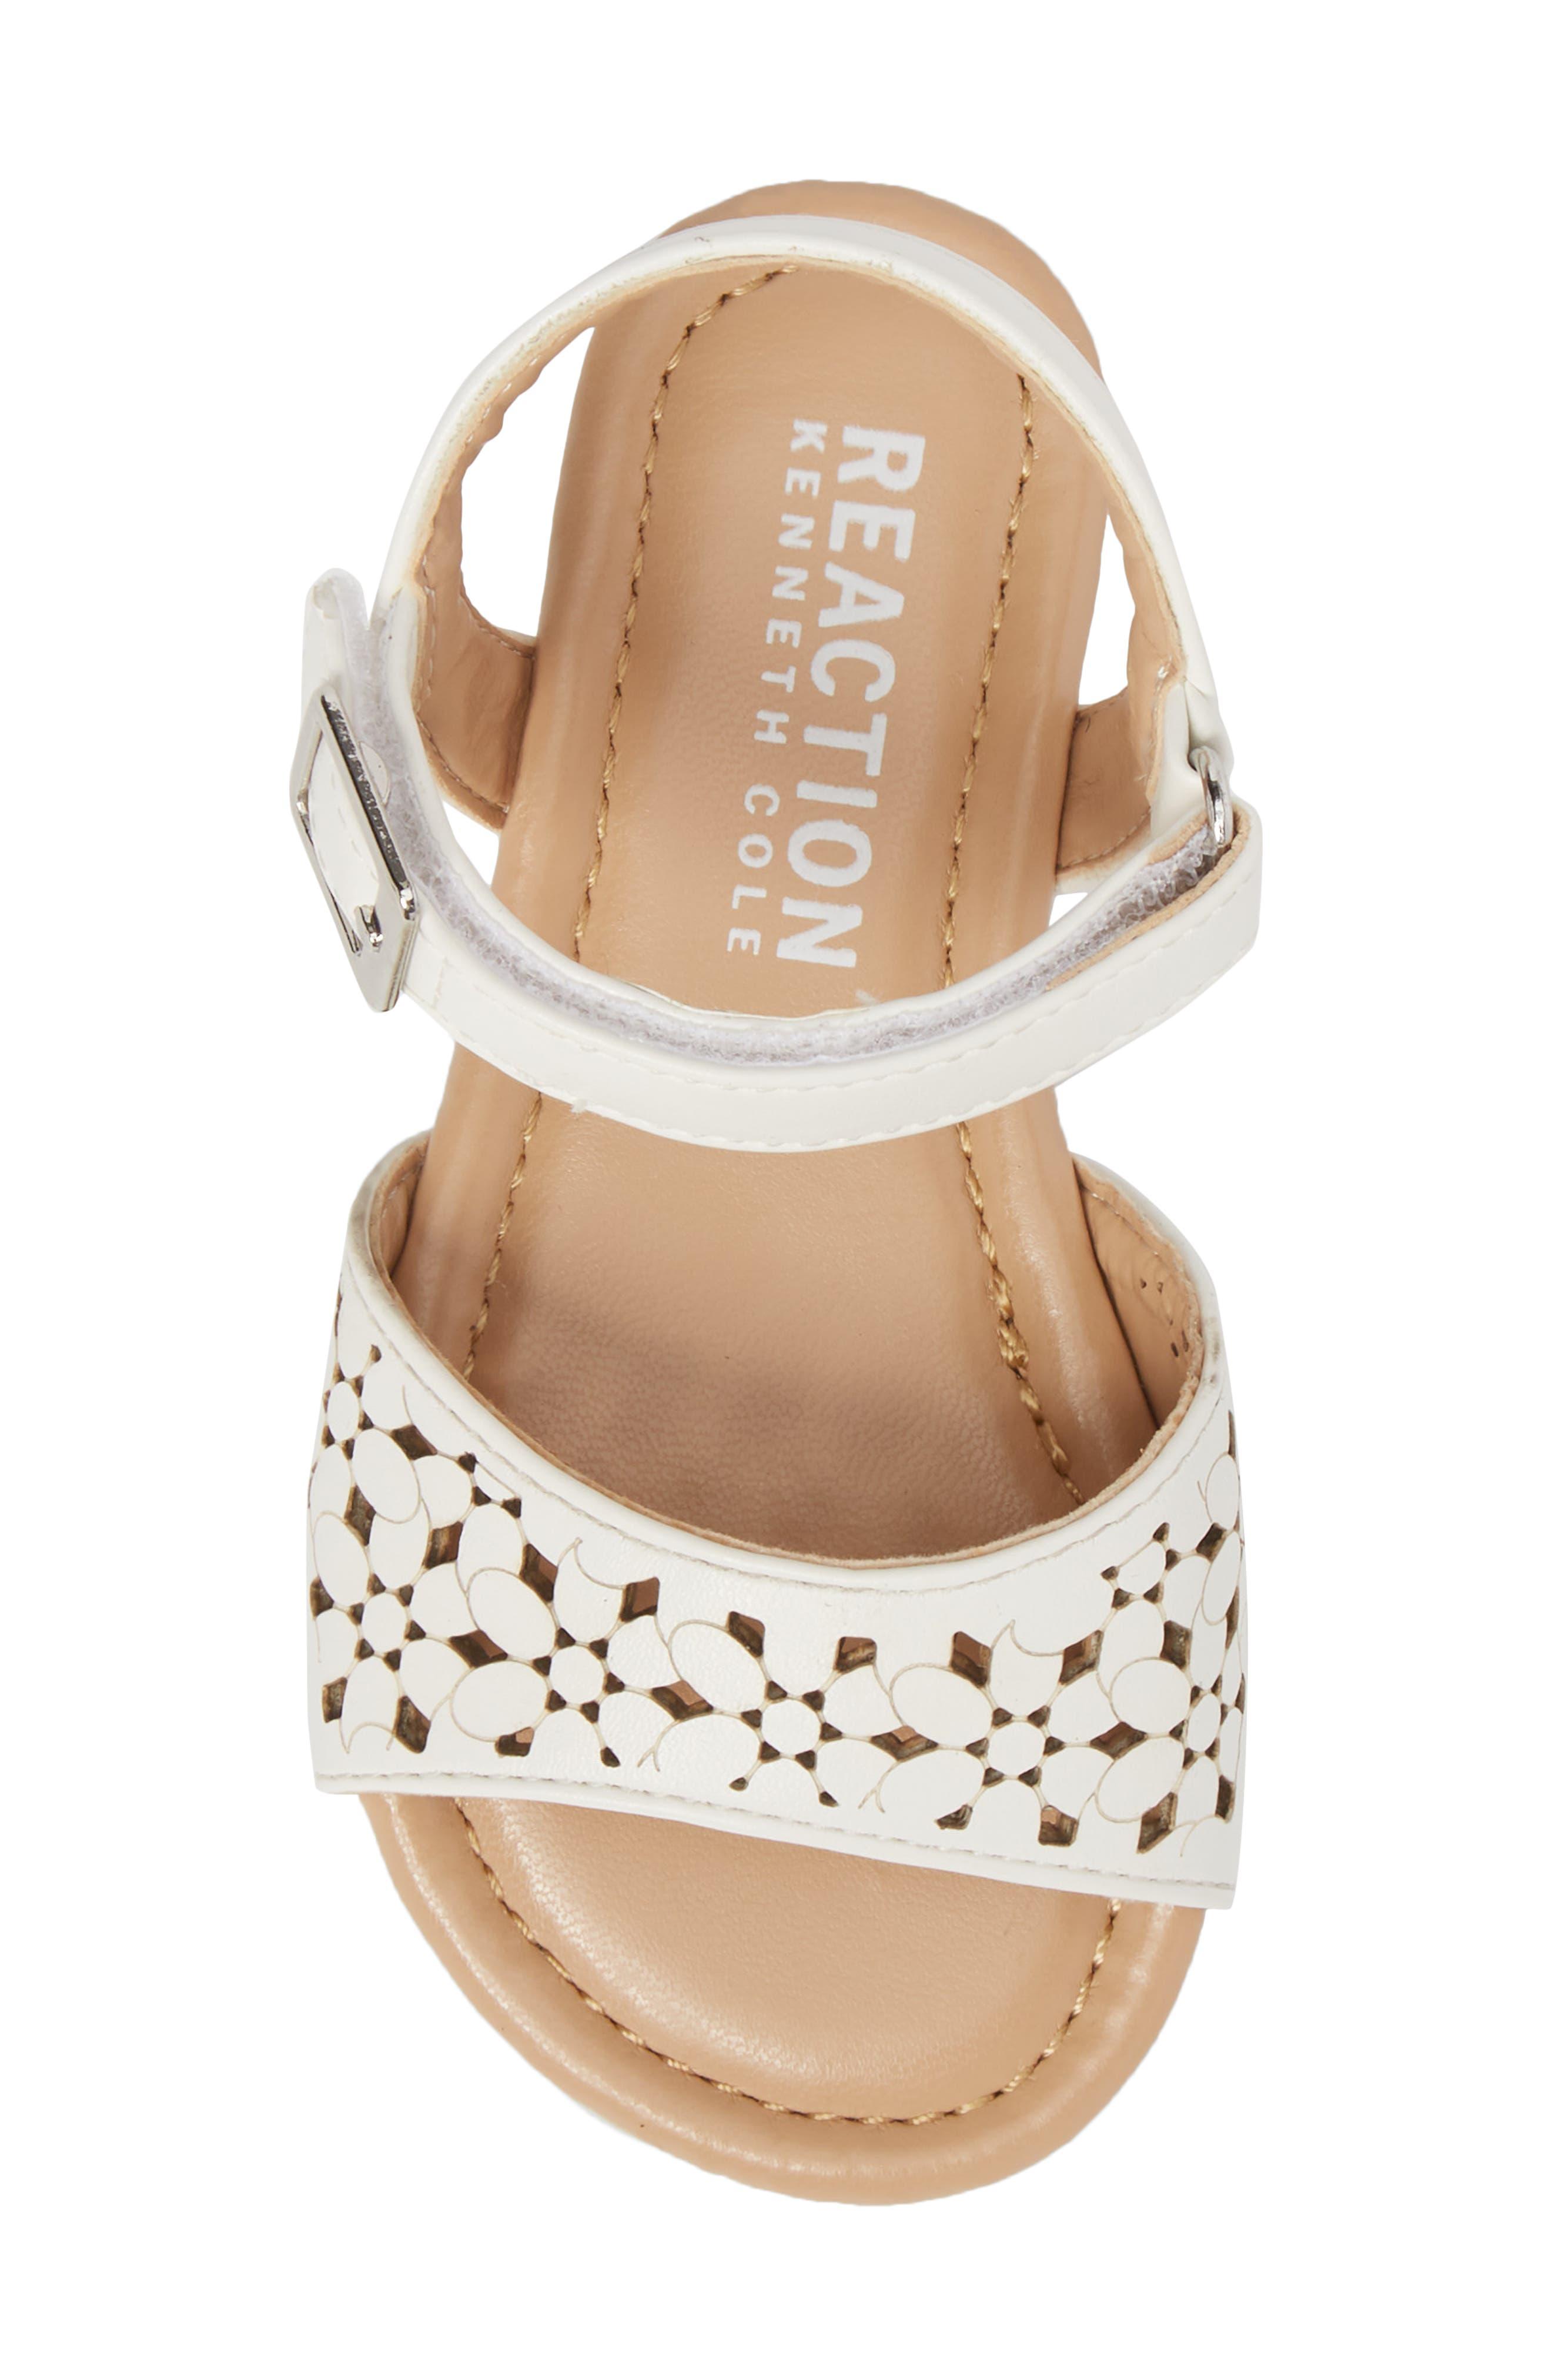 Kiera Perforated Sandal,                             Alternate thumbnail 5, color,                             100